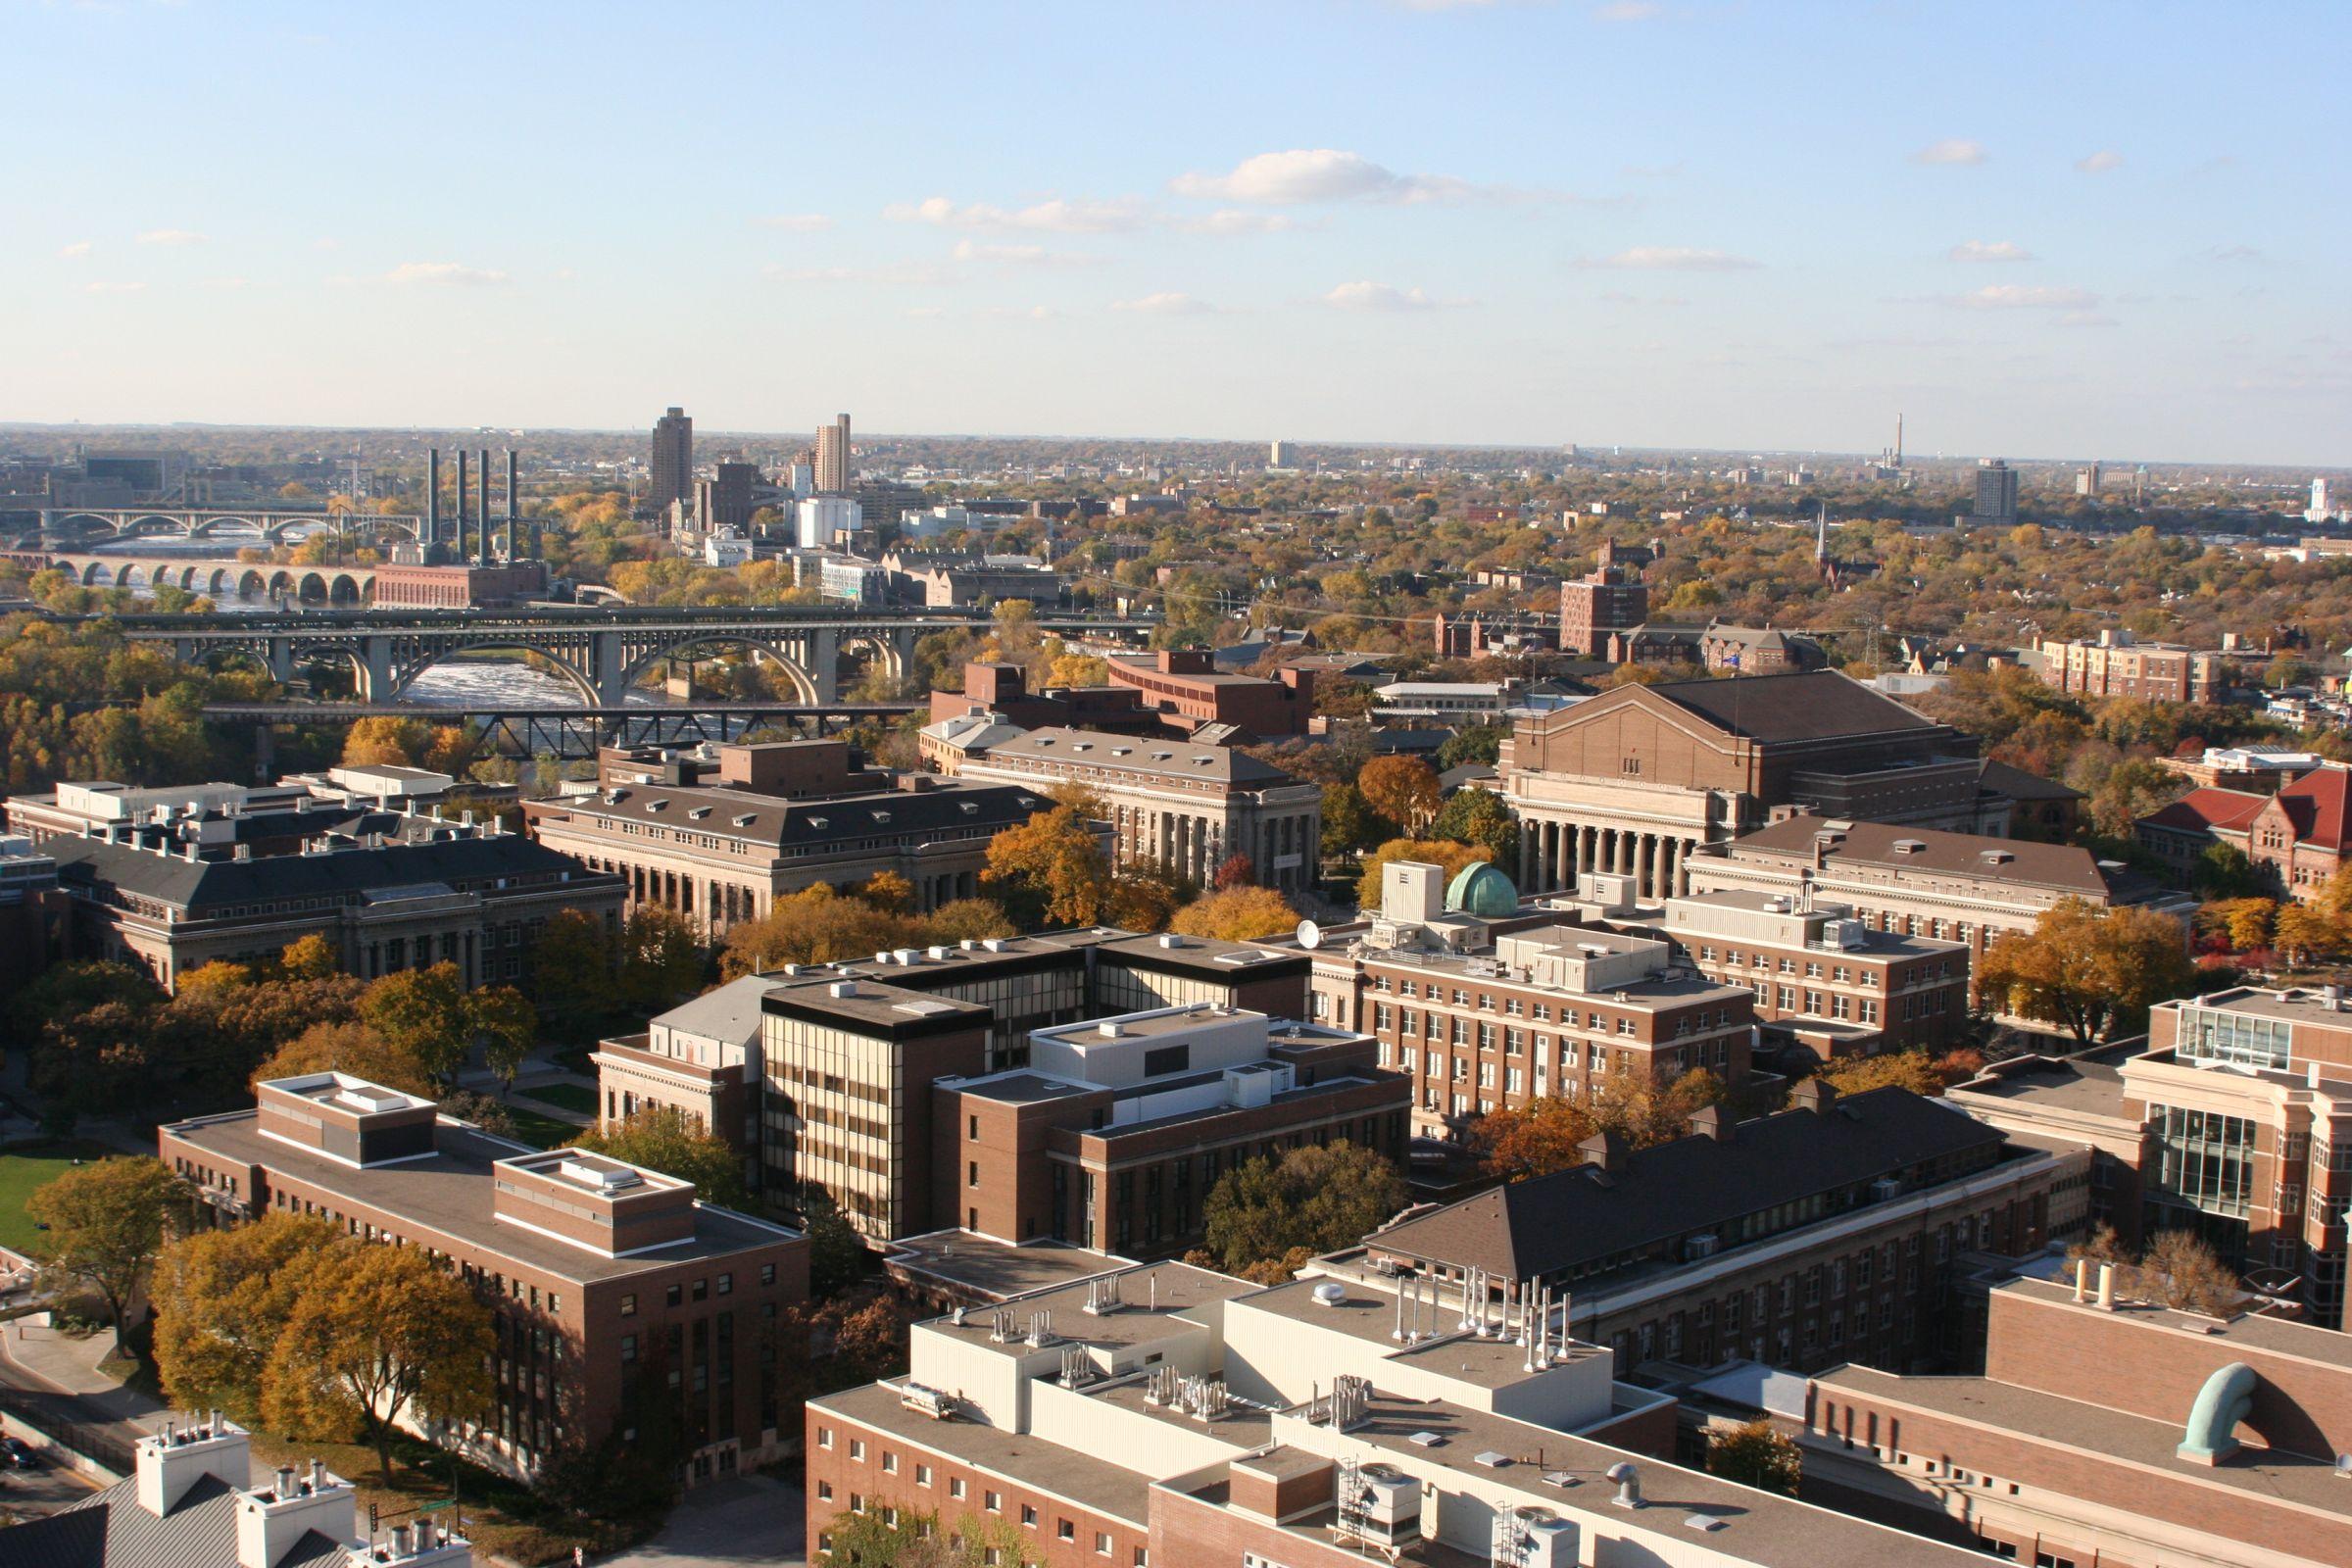 University_of_Minnesota_Medical_School_at_Twin_Cities_5648158